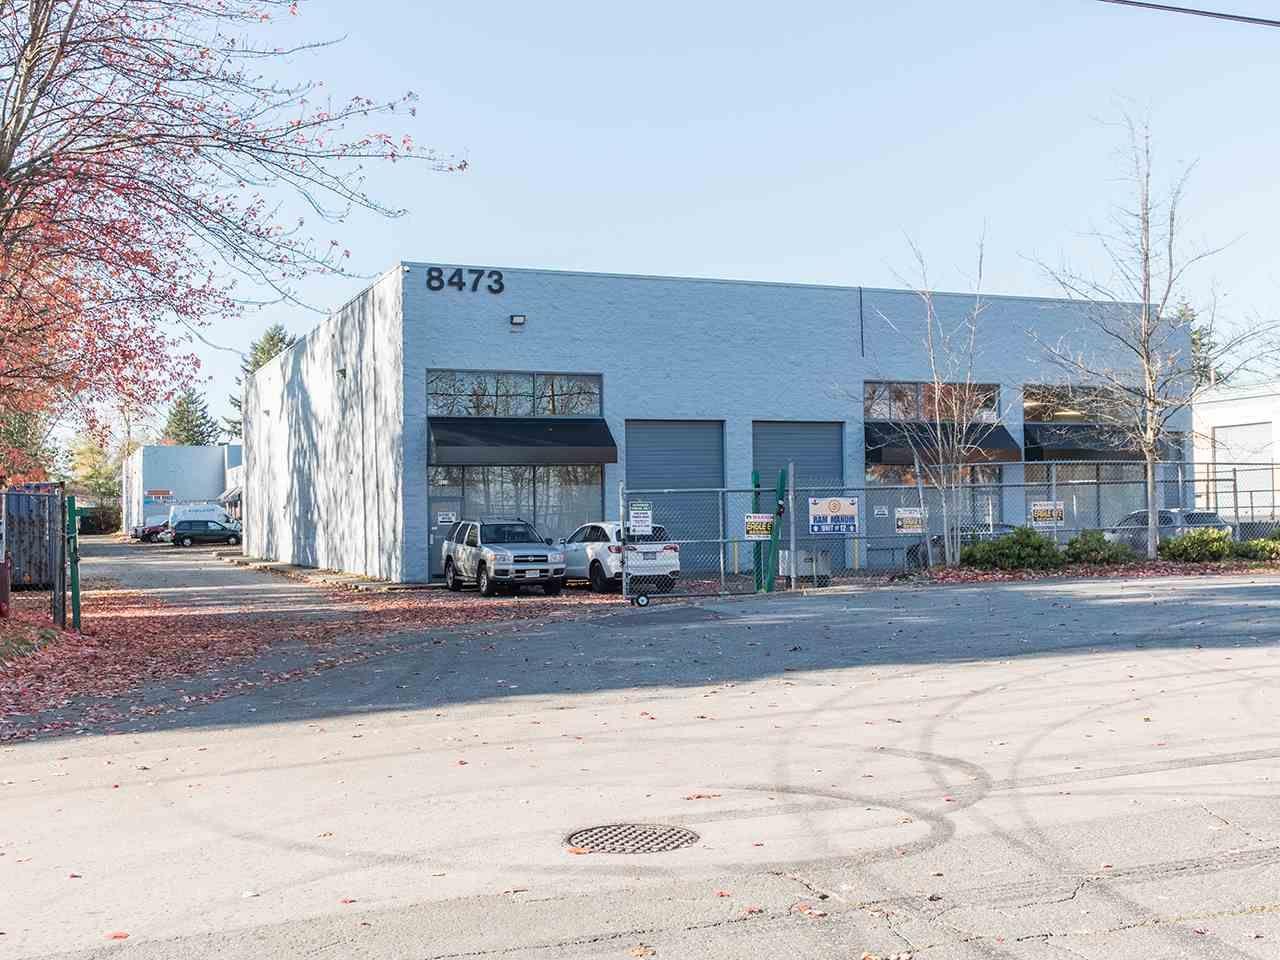 Main Photo: 12 8473 124 STREET in Surrey: Queen Mary Park Surrey Industrial for sale : MLS®# C8035157